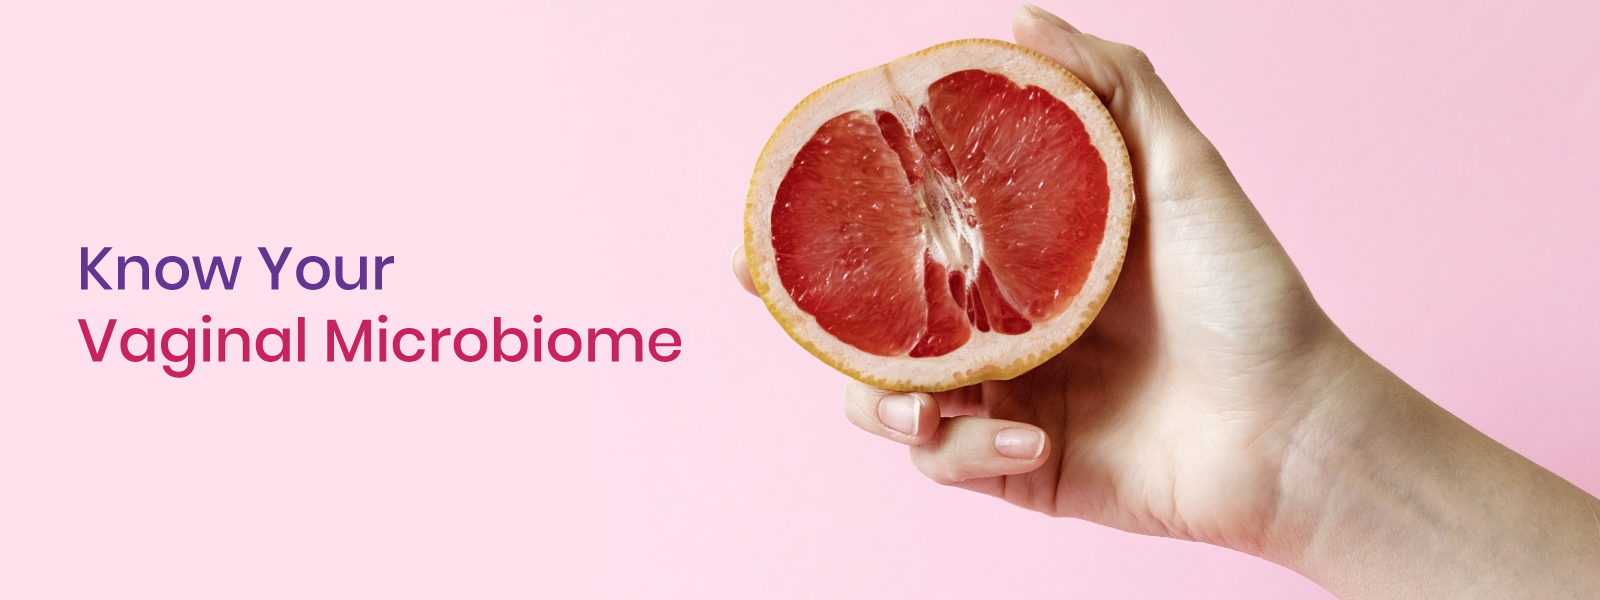 Know Your Vaginal Microbiome | Healthy Vaginal Microbiome | Vagibiom